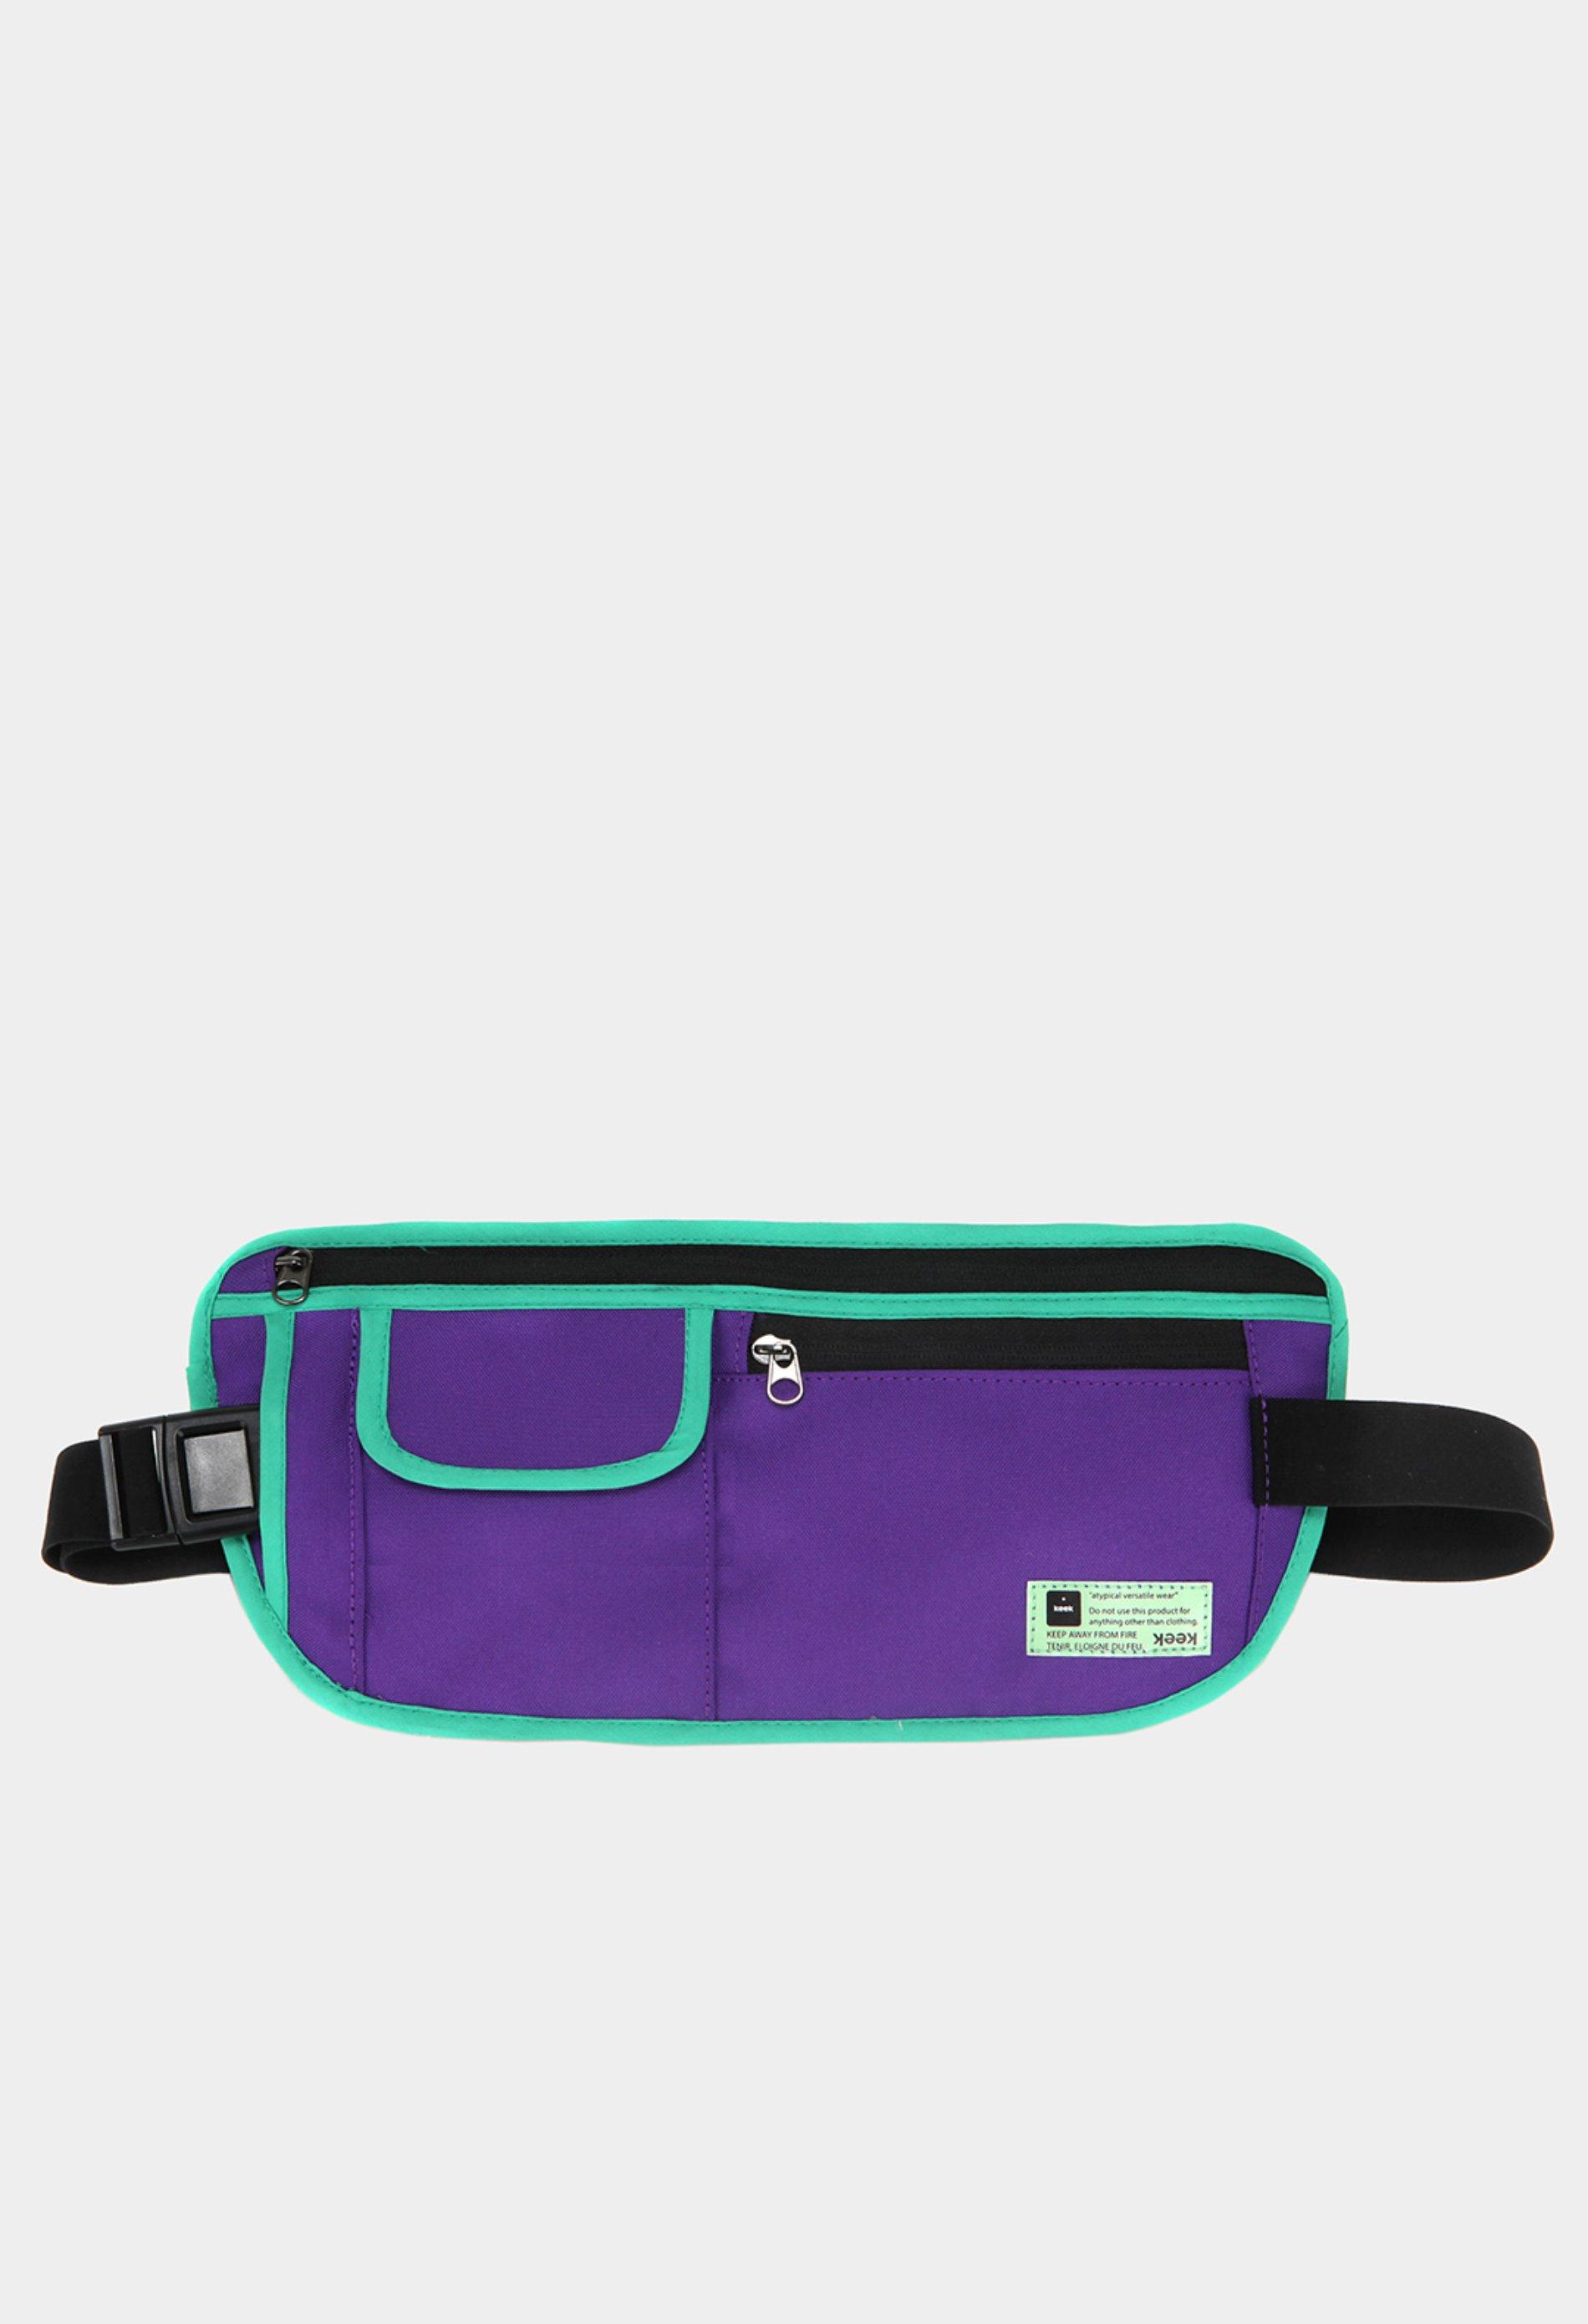 keek Belt bag - Purple 스트릿패션 유니섹스브랜드 커플시밀러룩 남자쇼핑몰 여성의류쇼핑몰 후드티 힙색